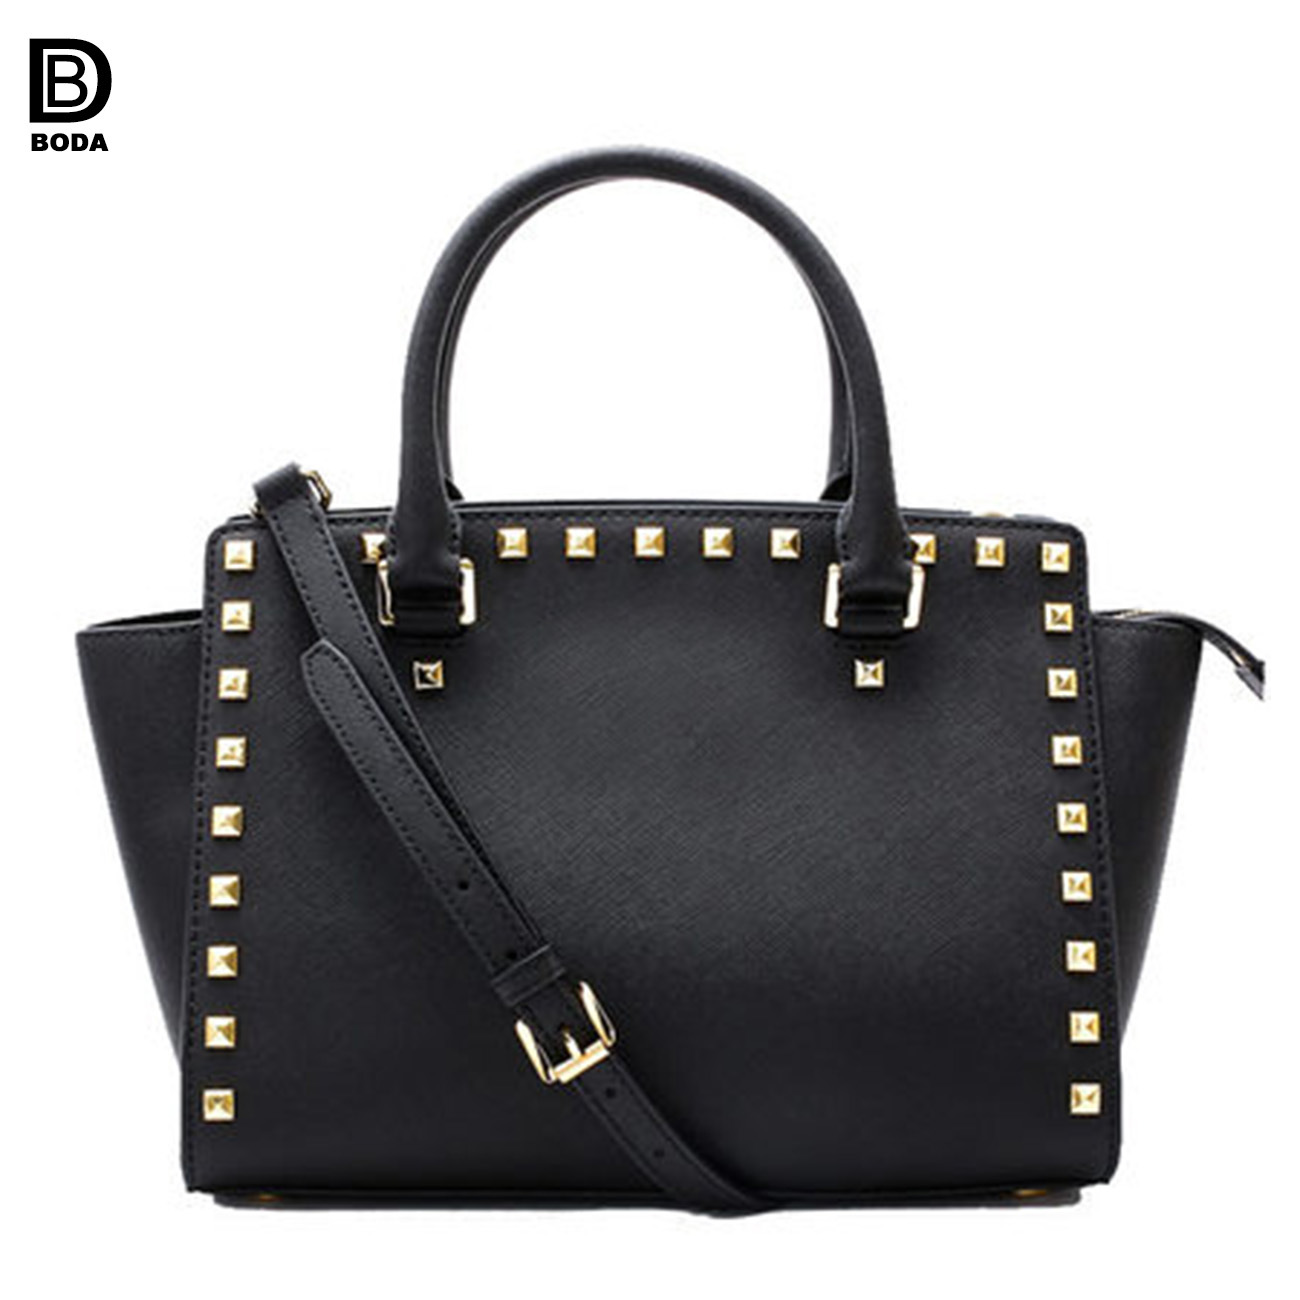 d107d7af0ba2 China Beautiful Design Popular Ladies PU Handbags for 2018 Hot Sale - China  Handbag